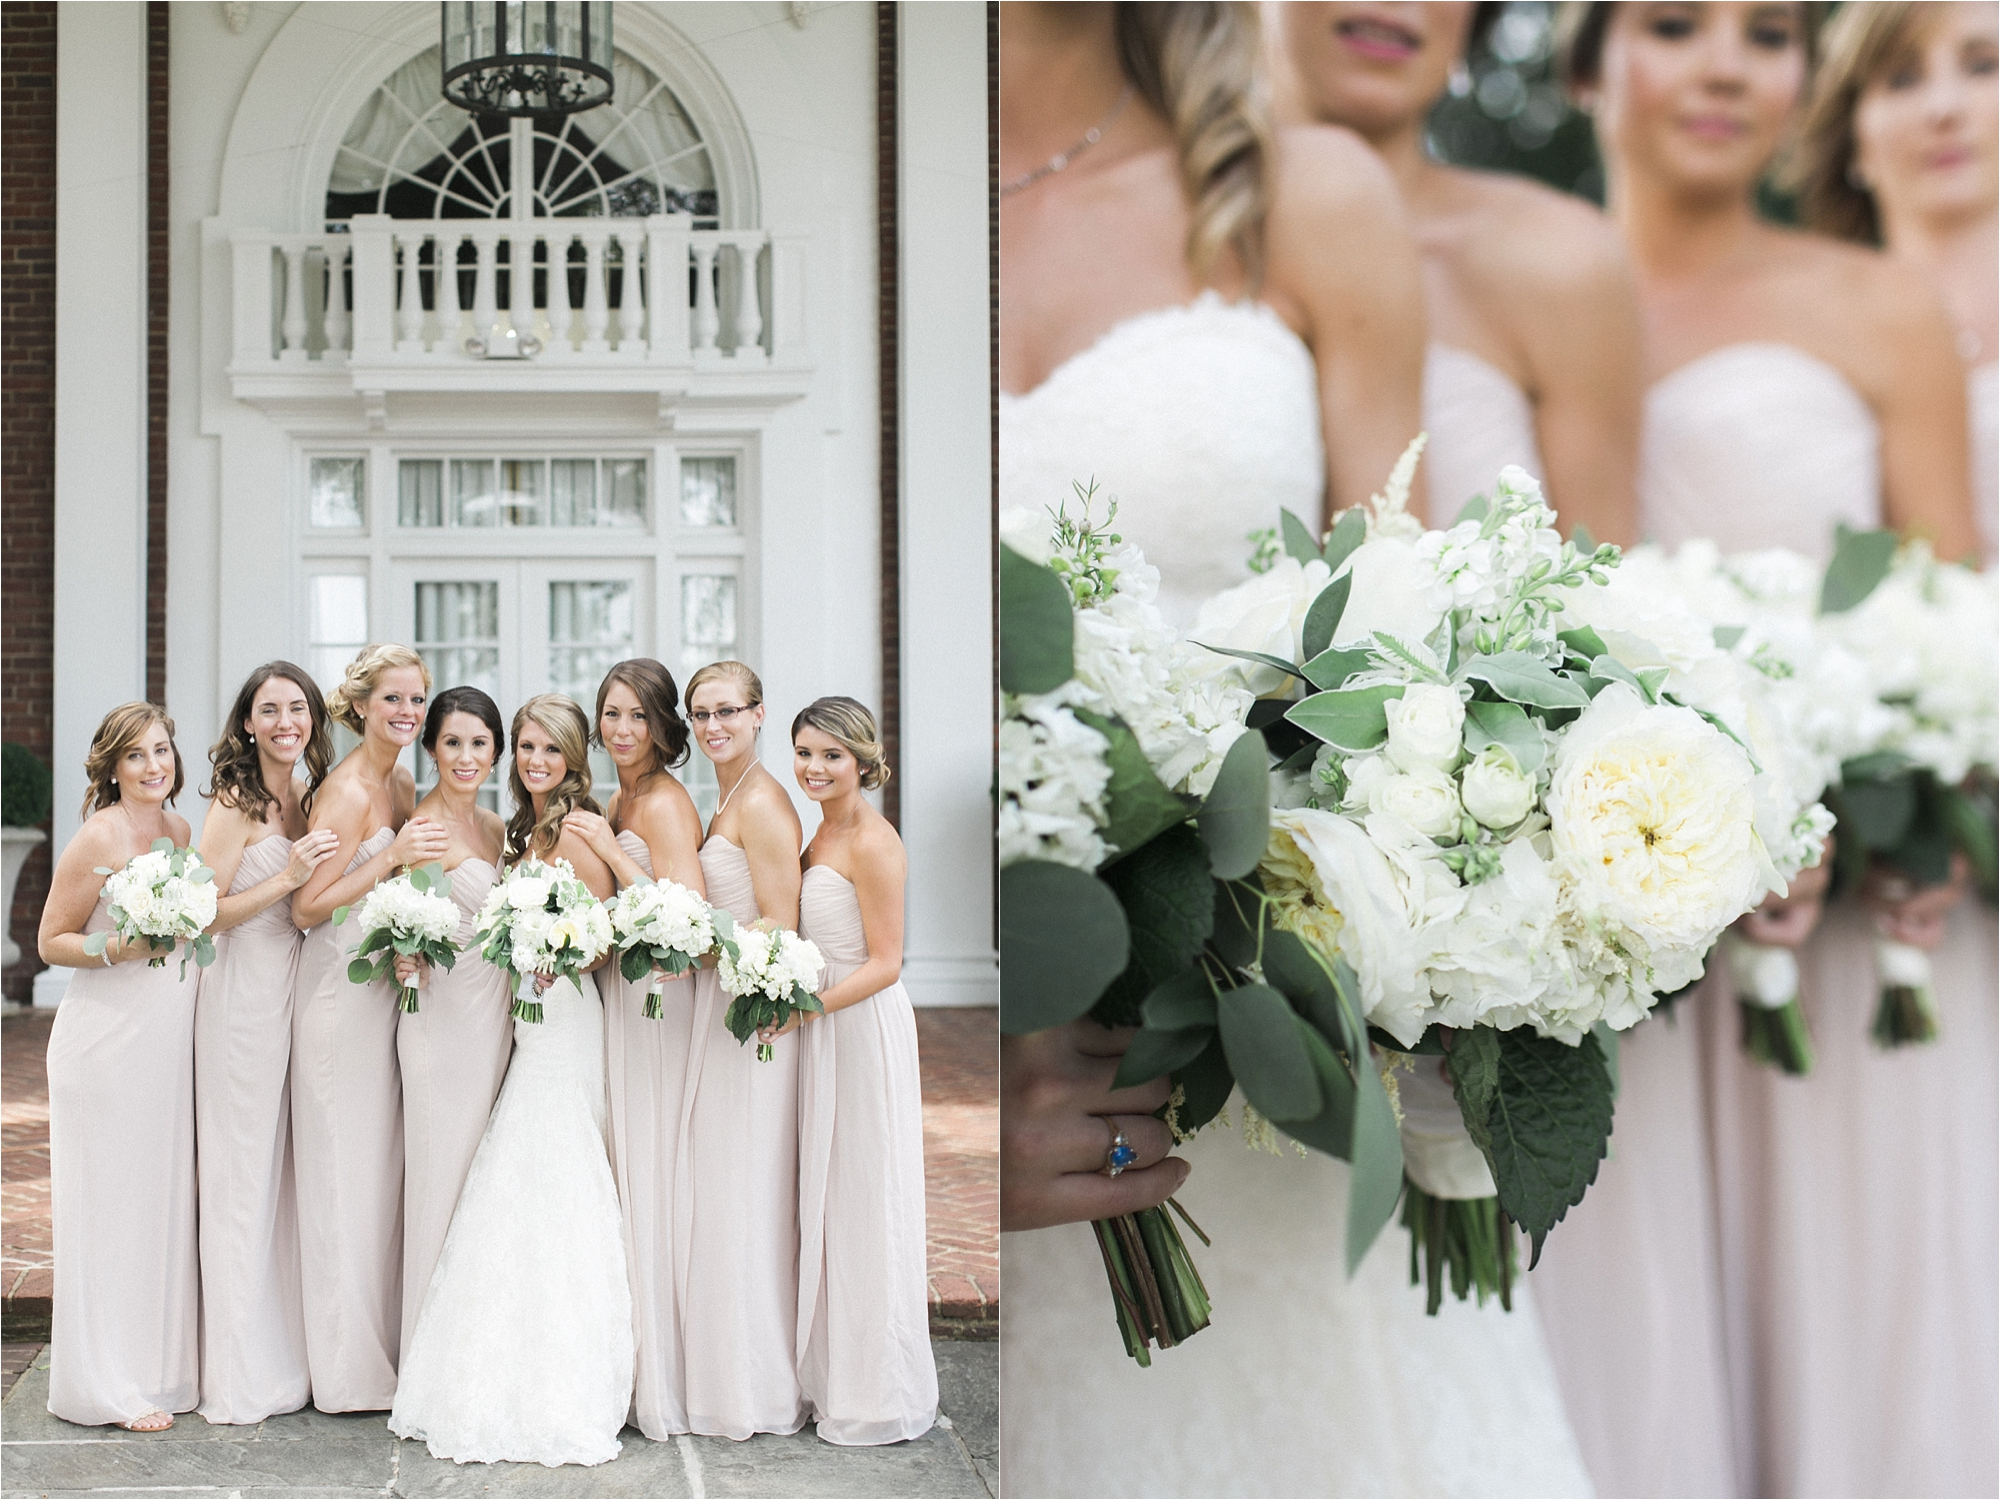 stephanie-yonce-photography-richmond-virginia-country-club-wedding_0030.jpg